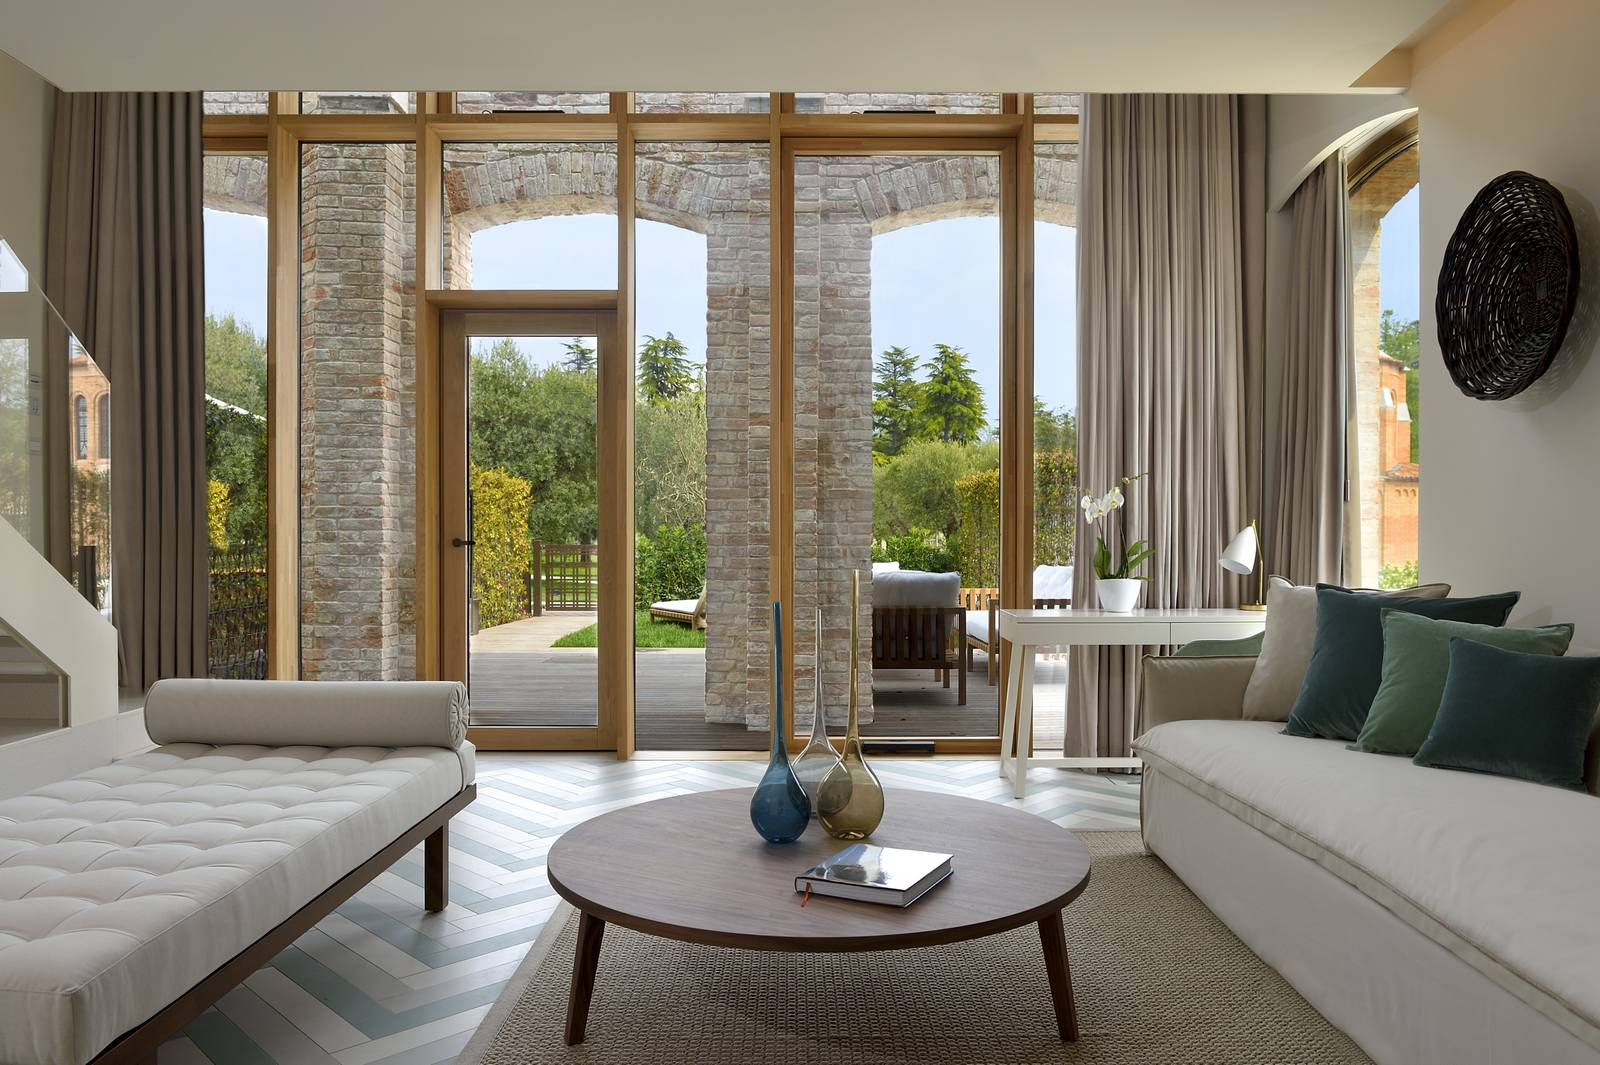 Jw marriott venice resort spa review gtspirit for Design boutique hotel venice